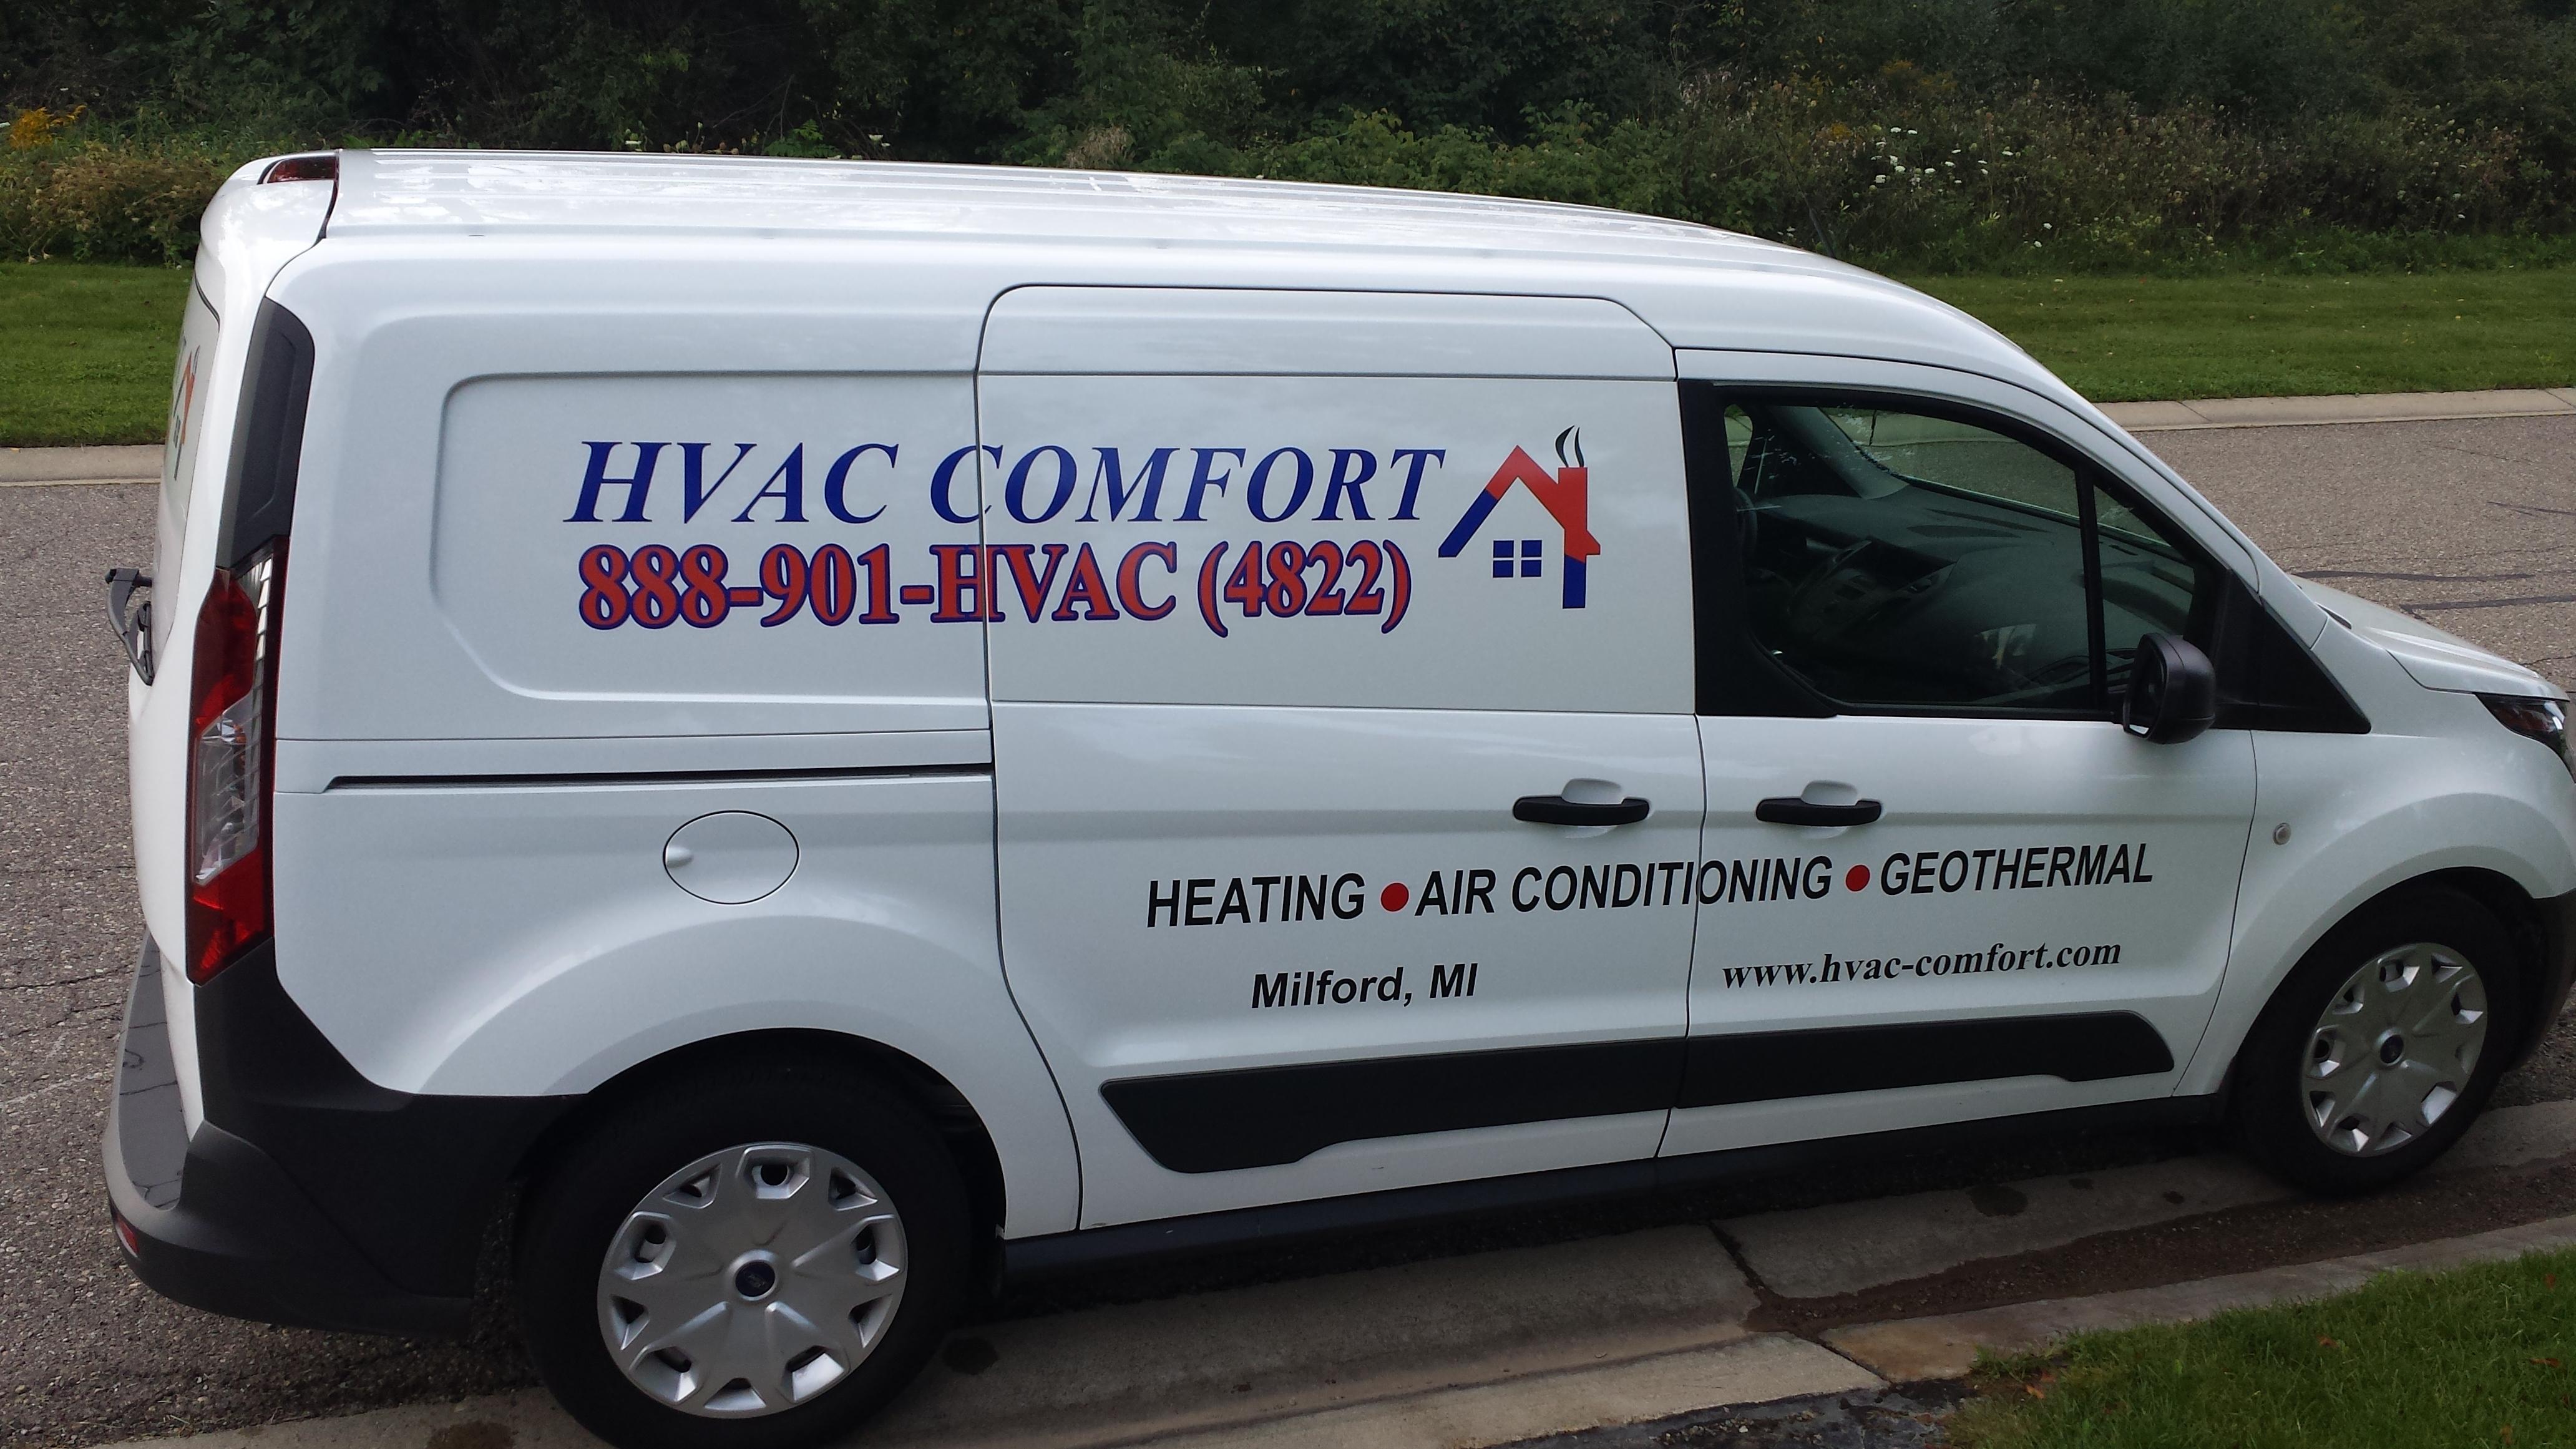 HVAC Comfort Inc logo